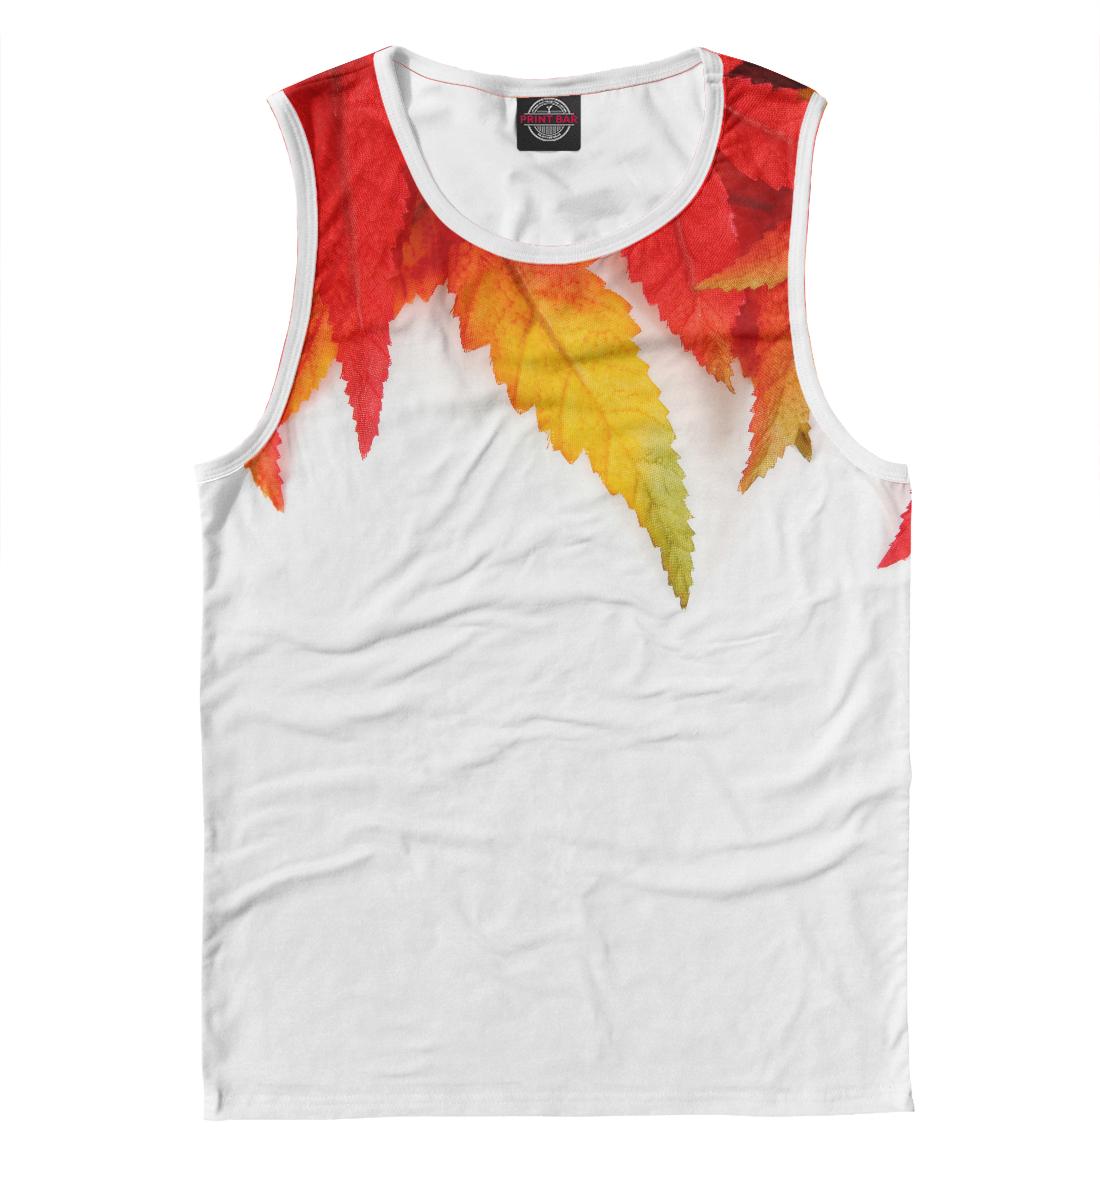 Купить Осень, Printbar, Майки, PEY-948495-may-2